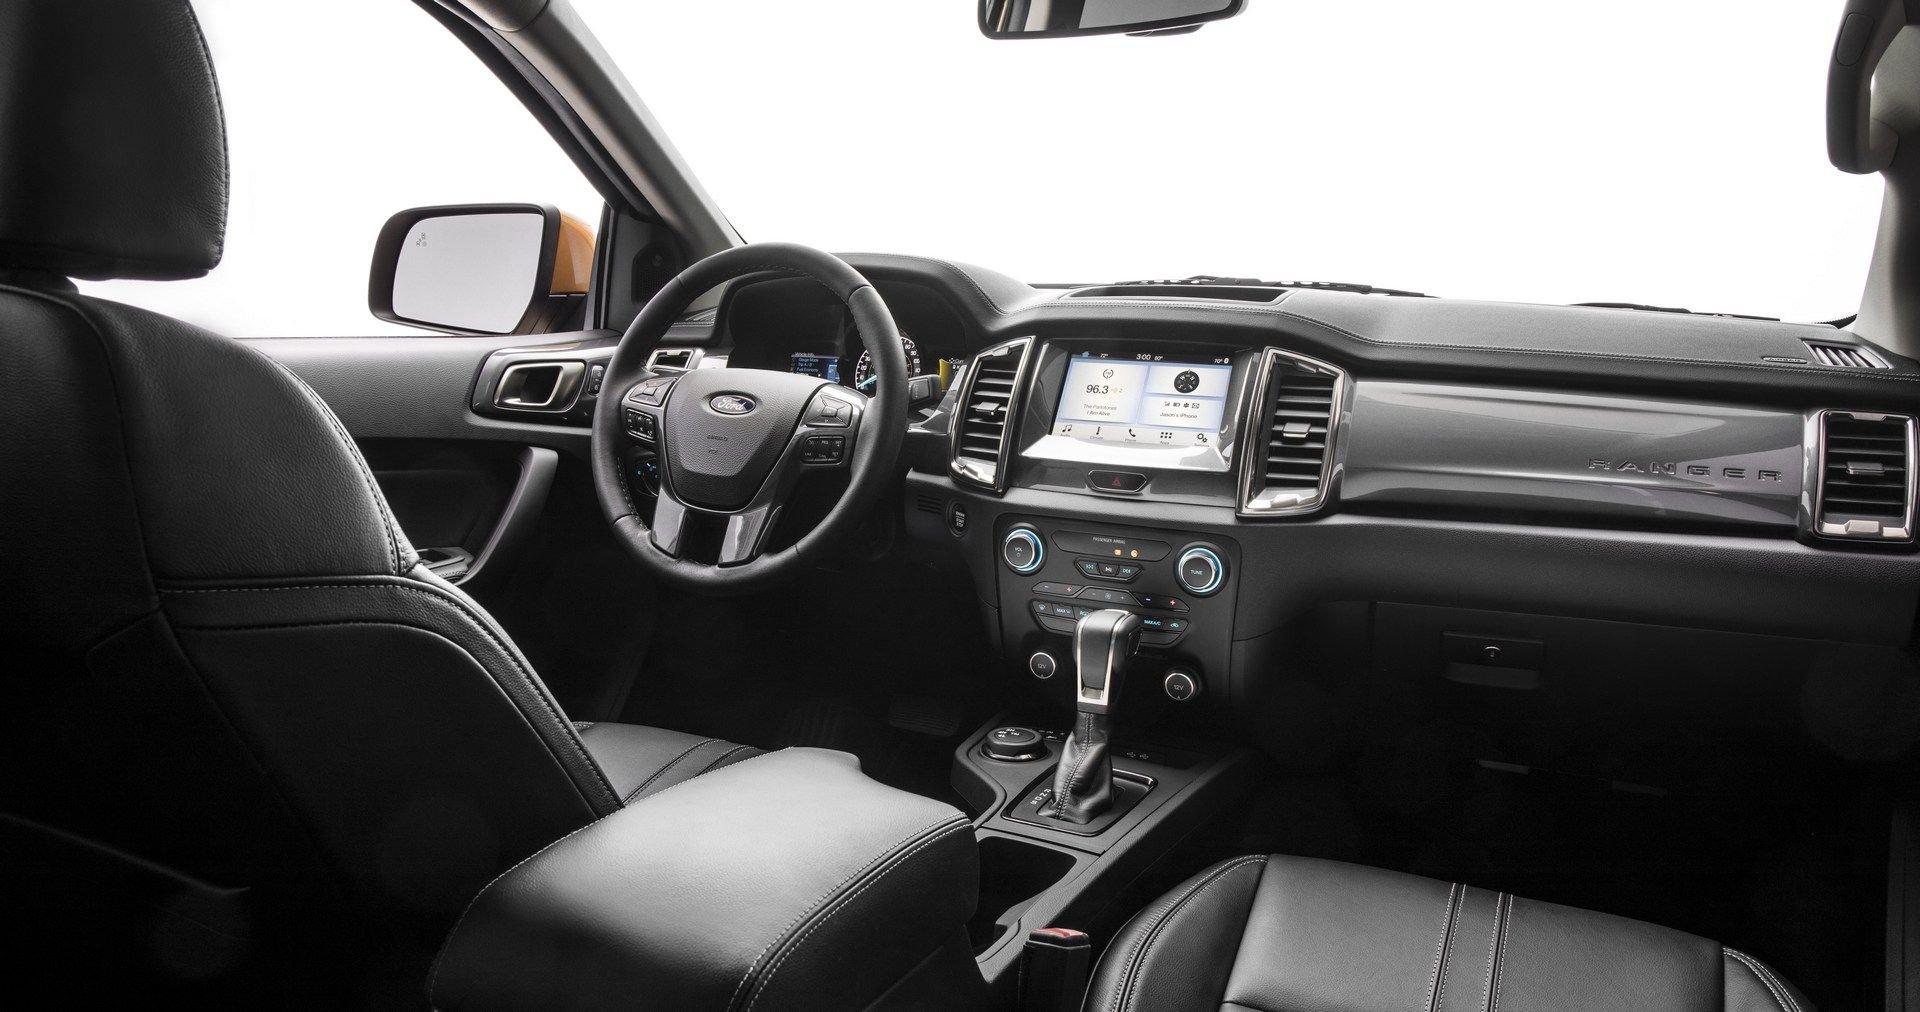 fdd5aaf6-ford-new-car-smell-1